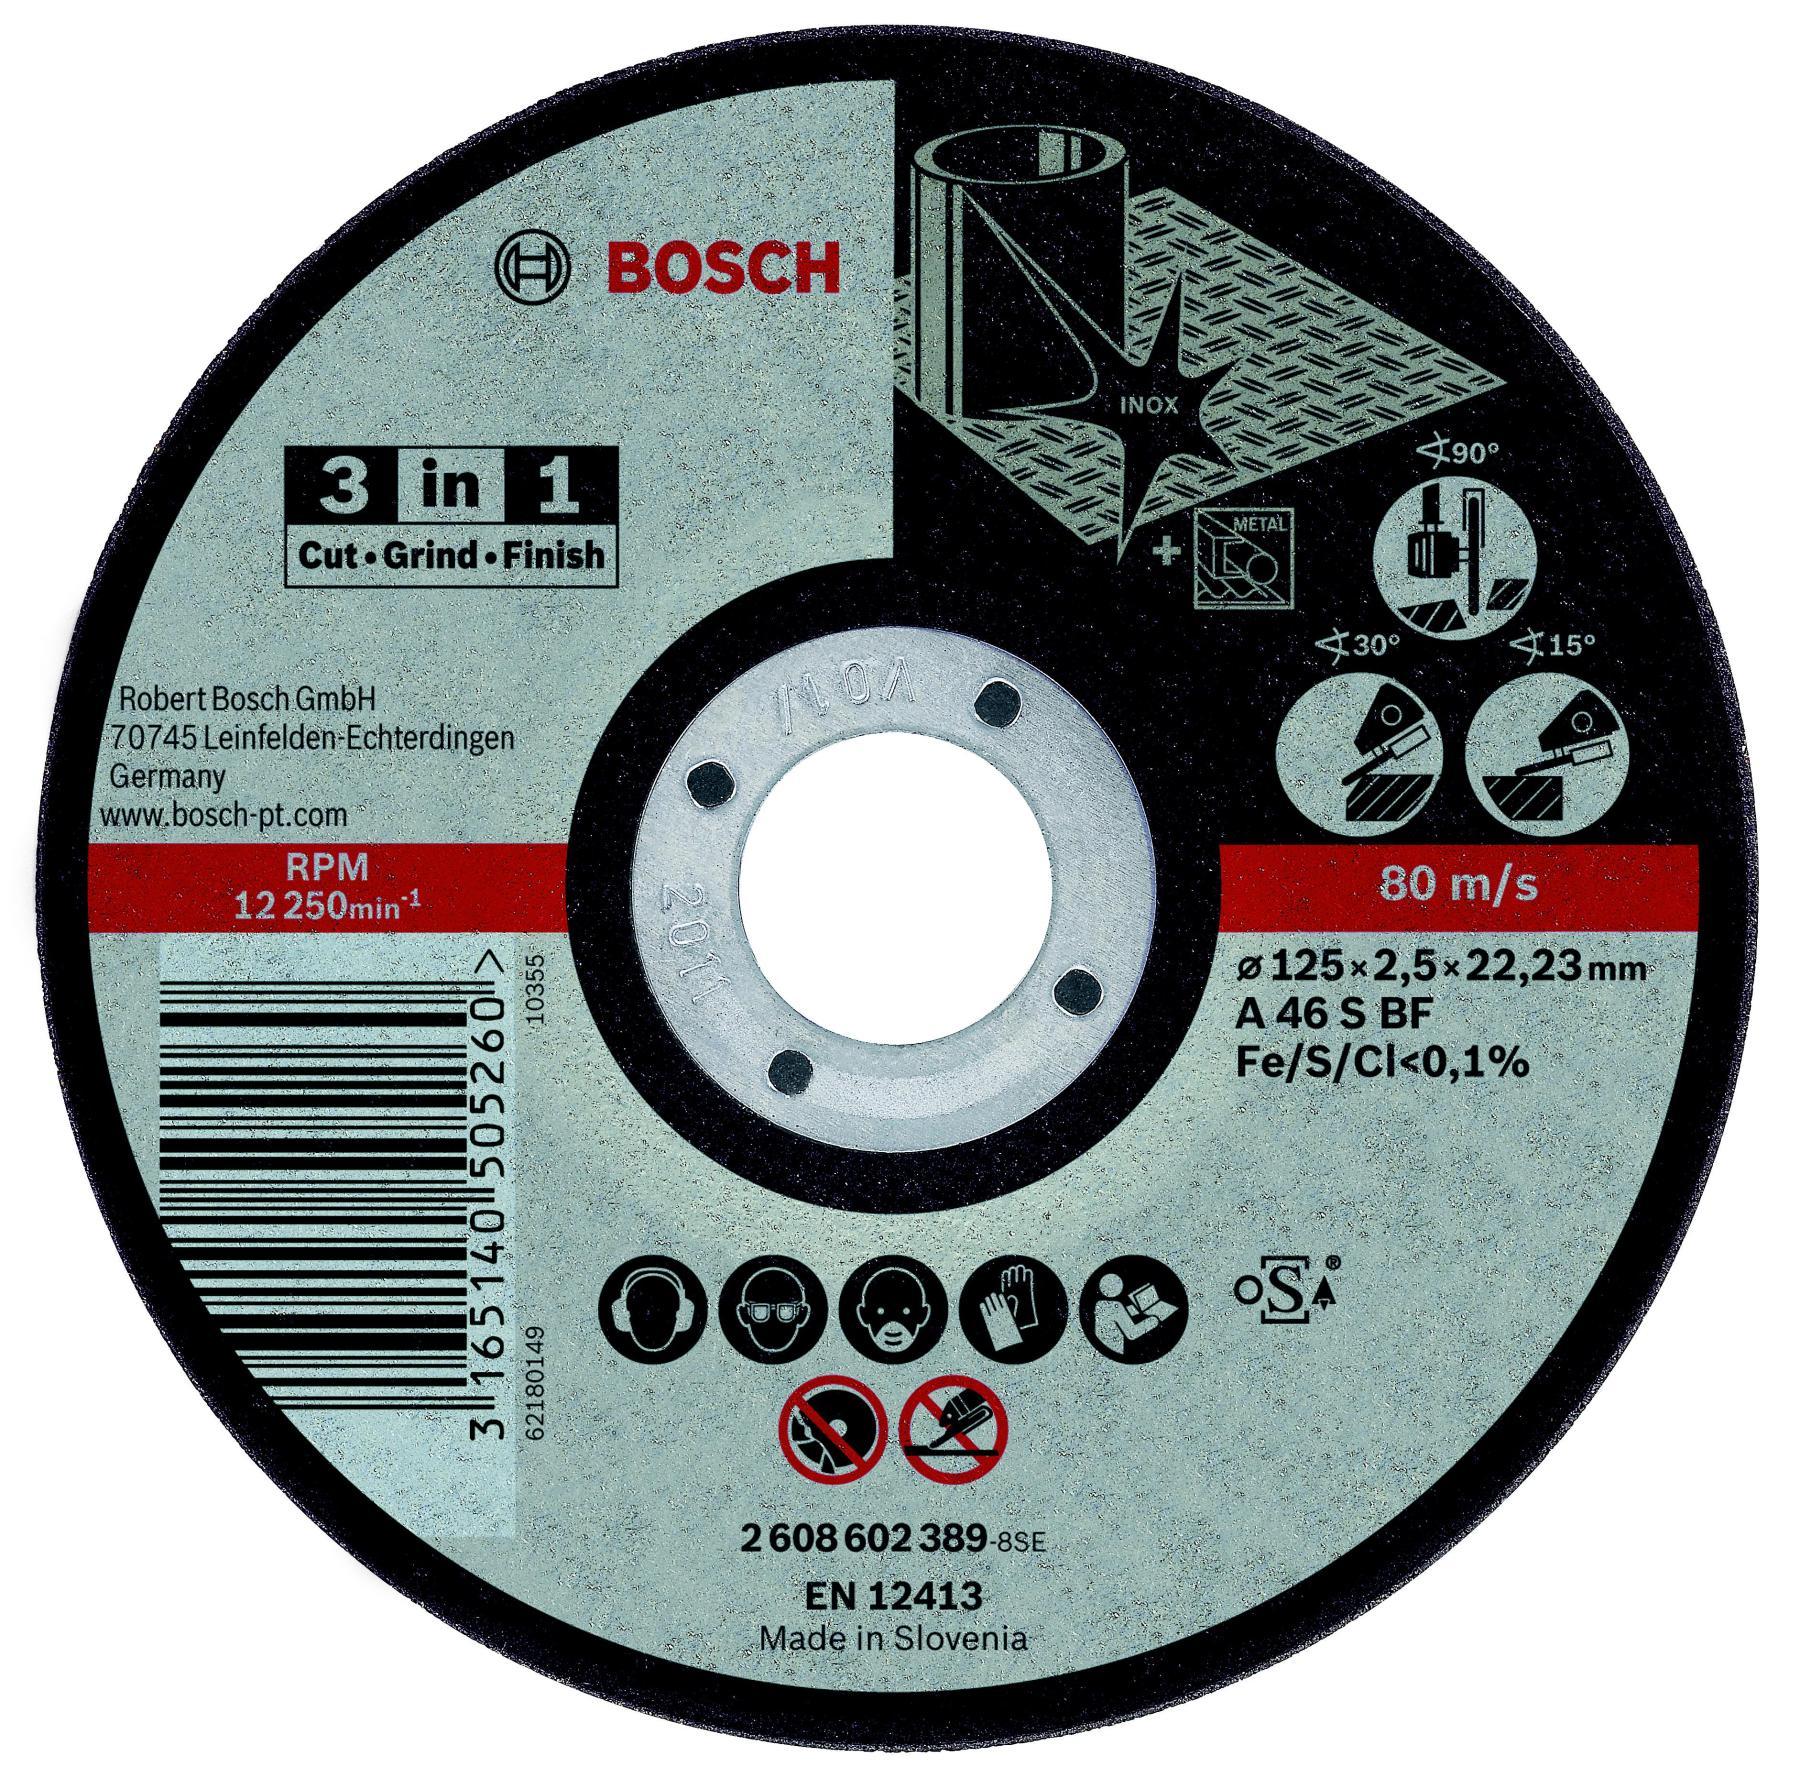 Circle Cutting BOSCH 125х2. 5х22 BOSCH 3 In 1 (2.608.602.389)